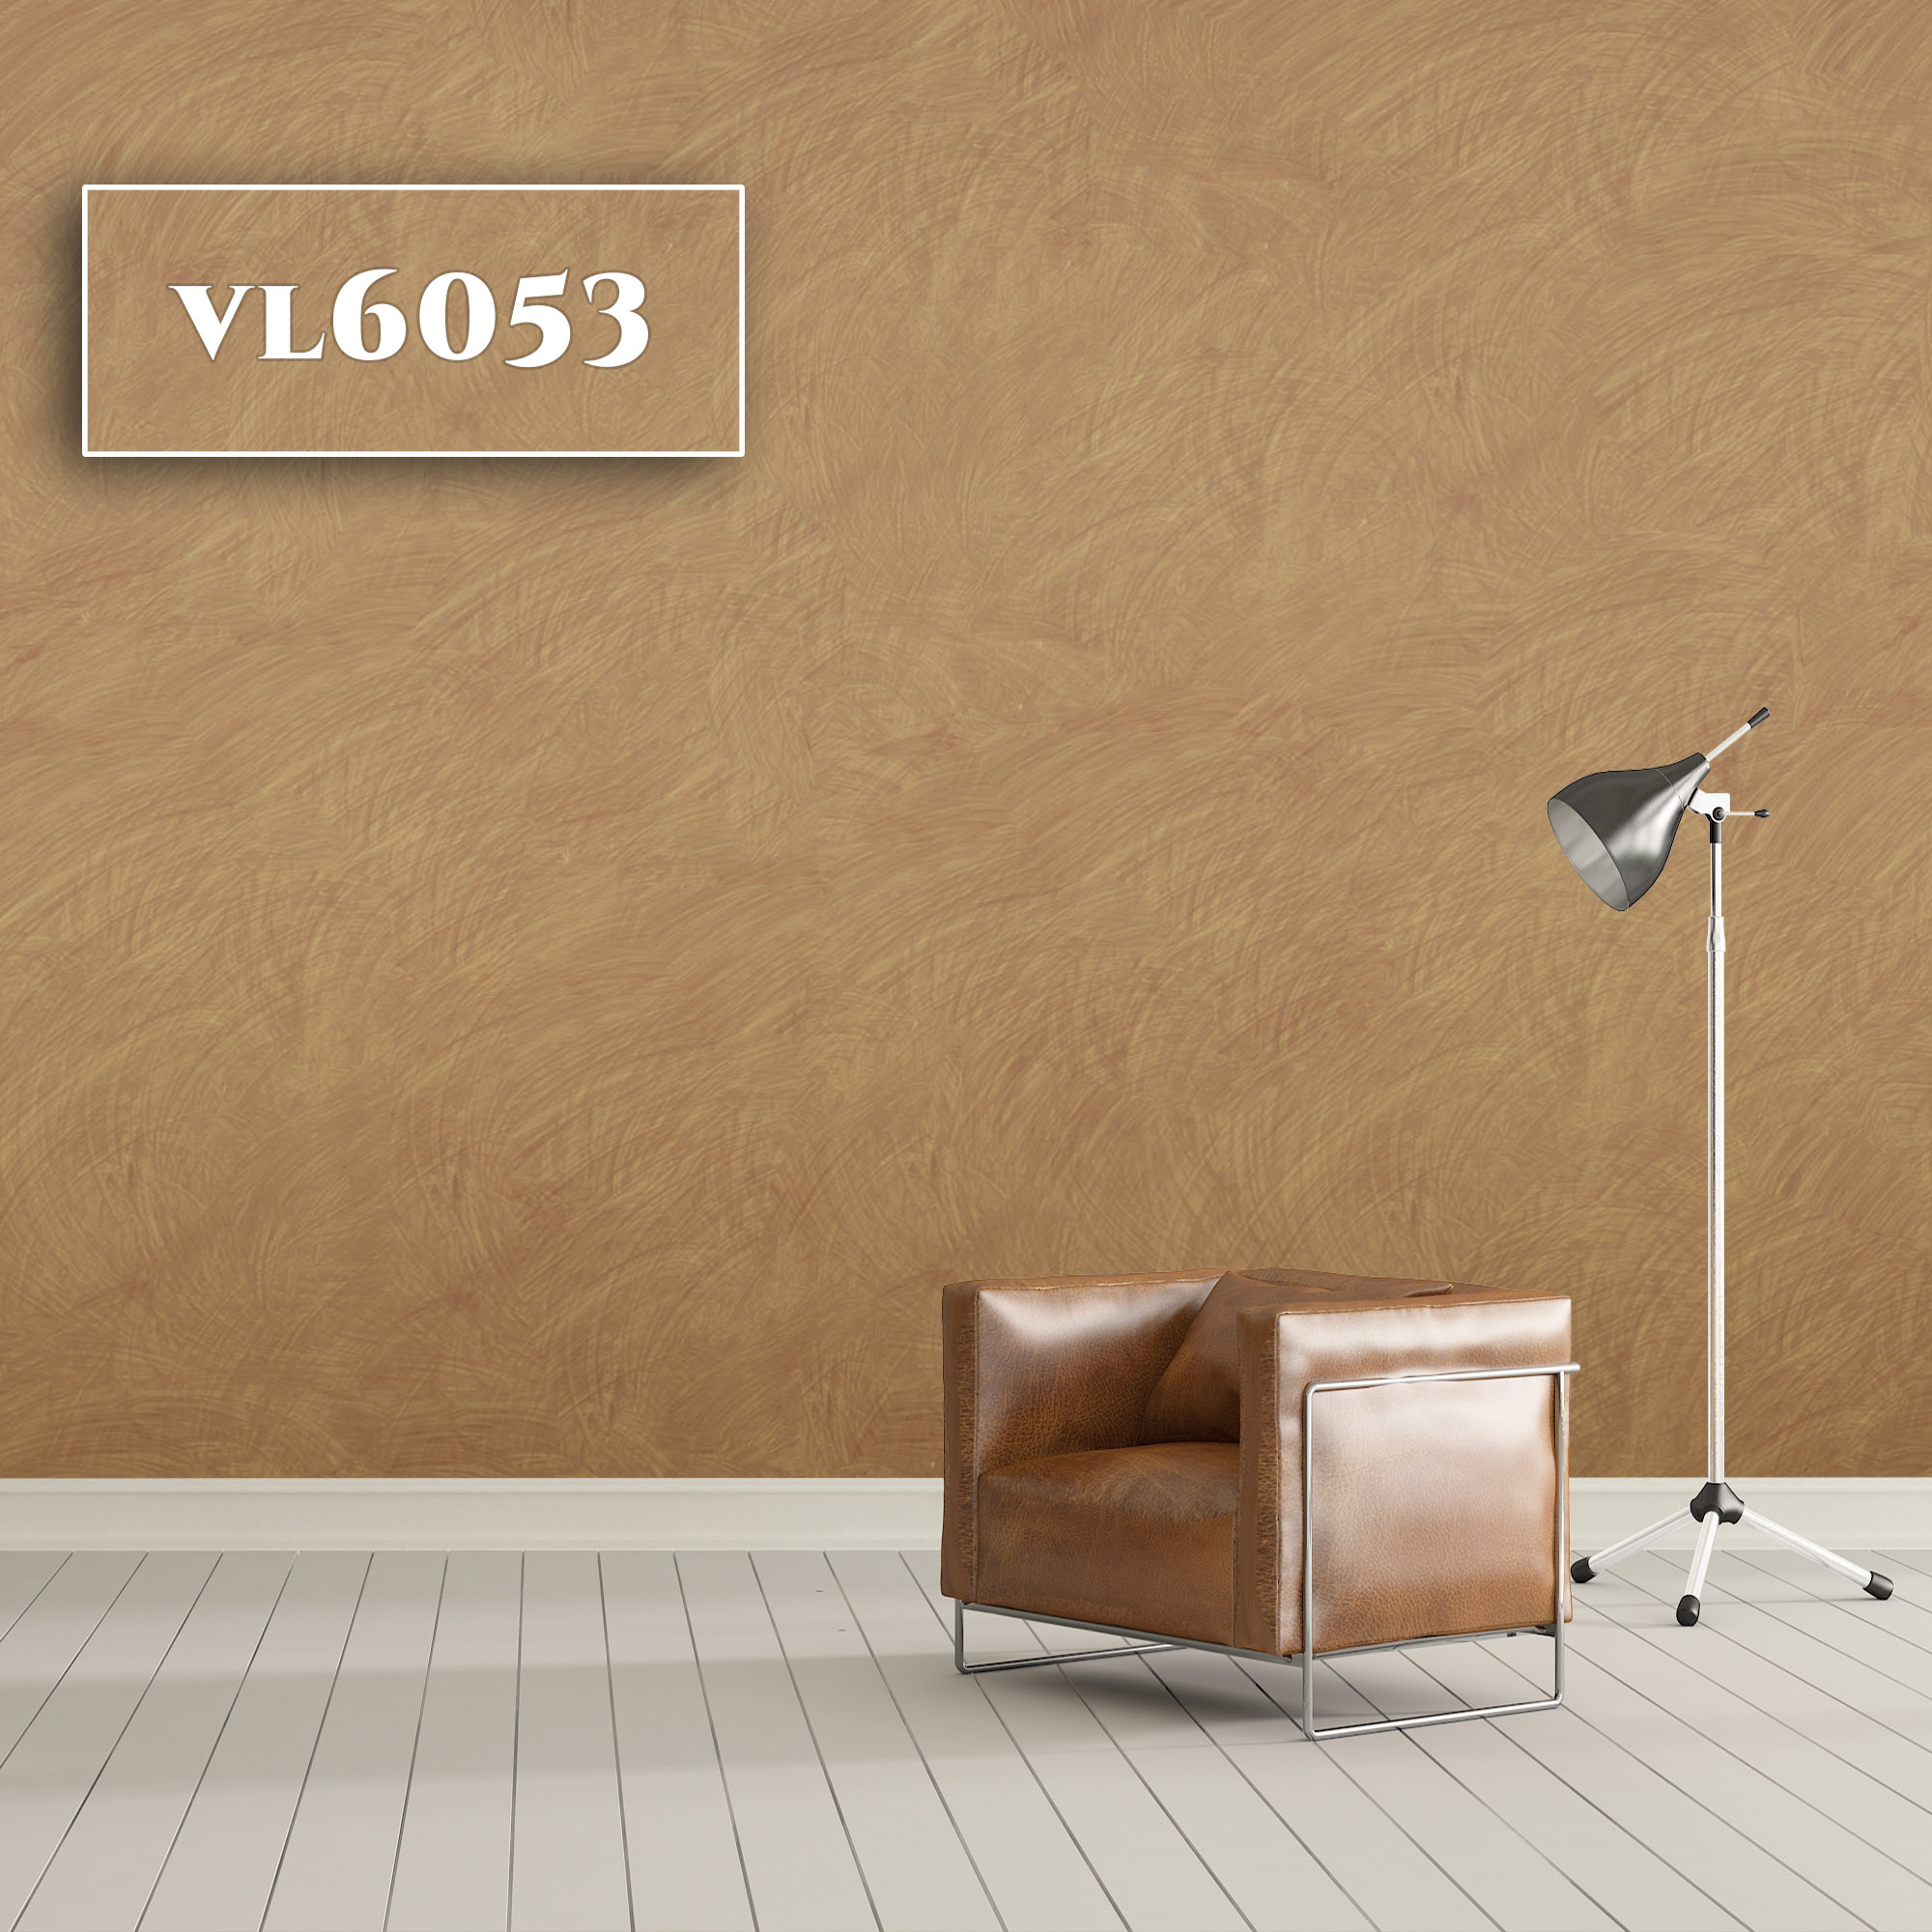 VL6053